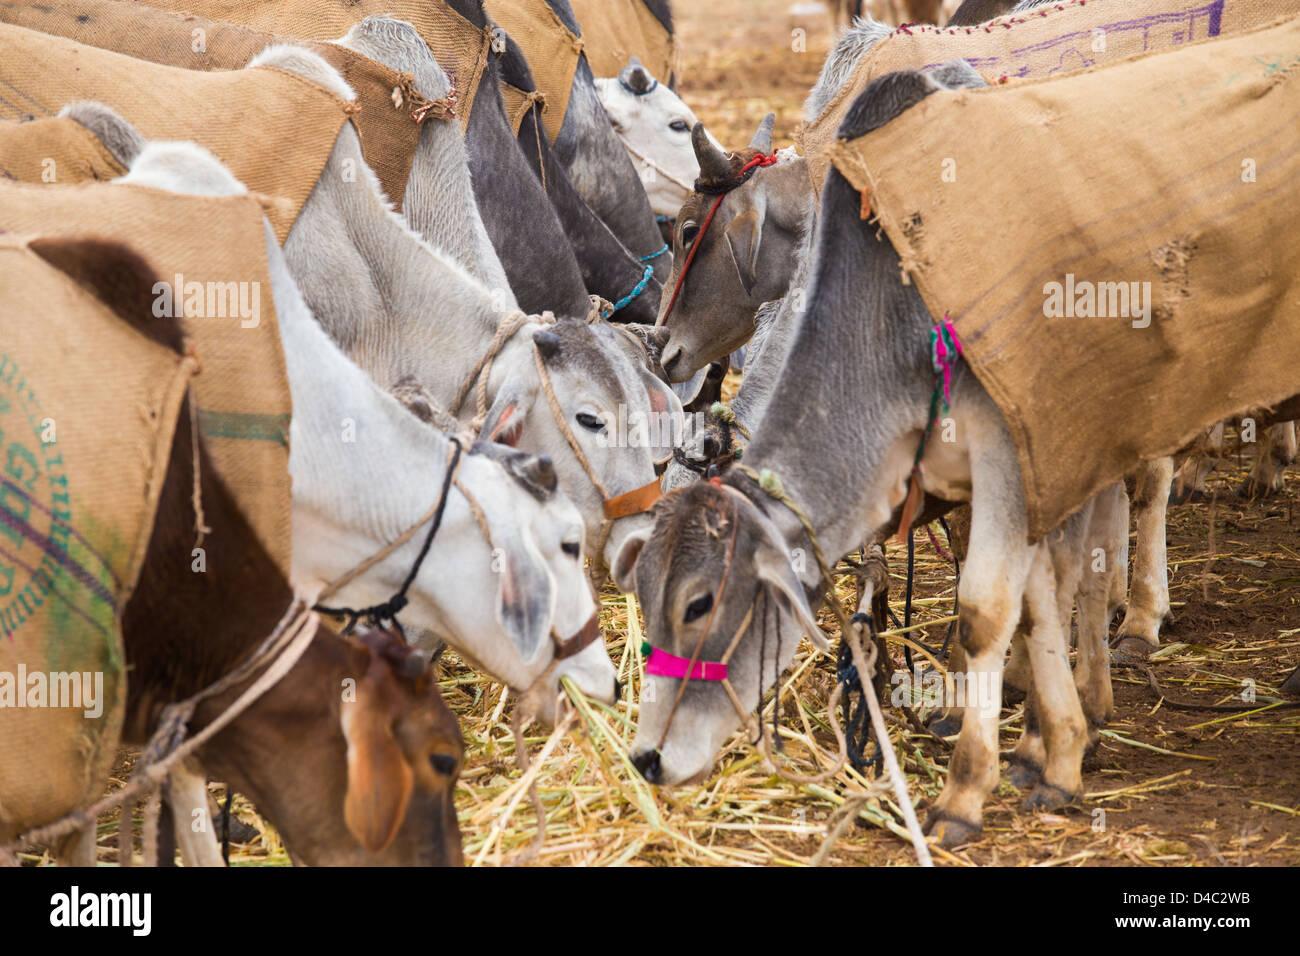 Nagaur fiera del bestiame, Nagaur, Rajasthan, India Immagini Stock